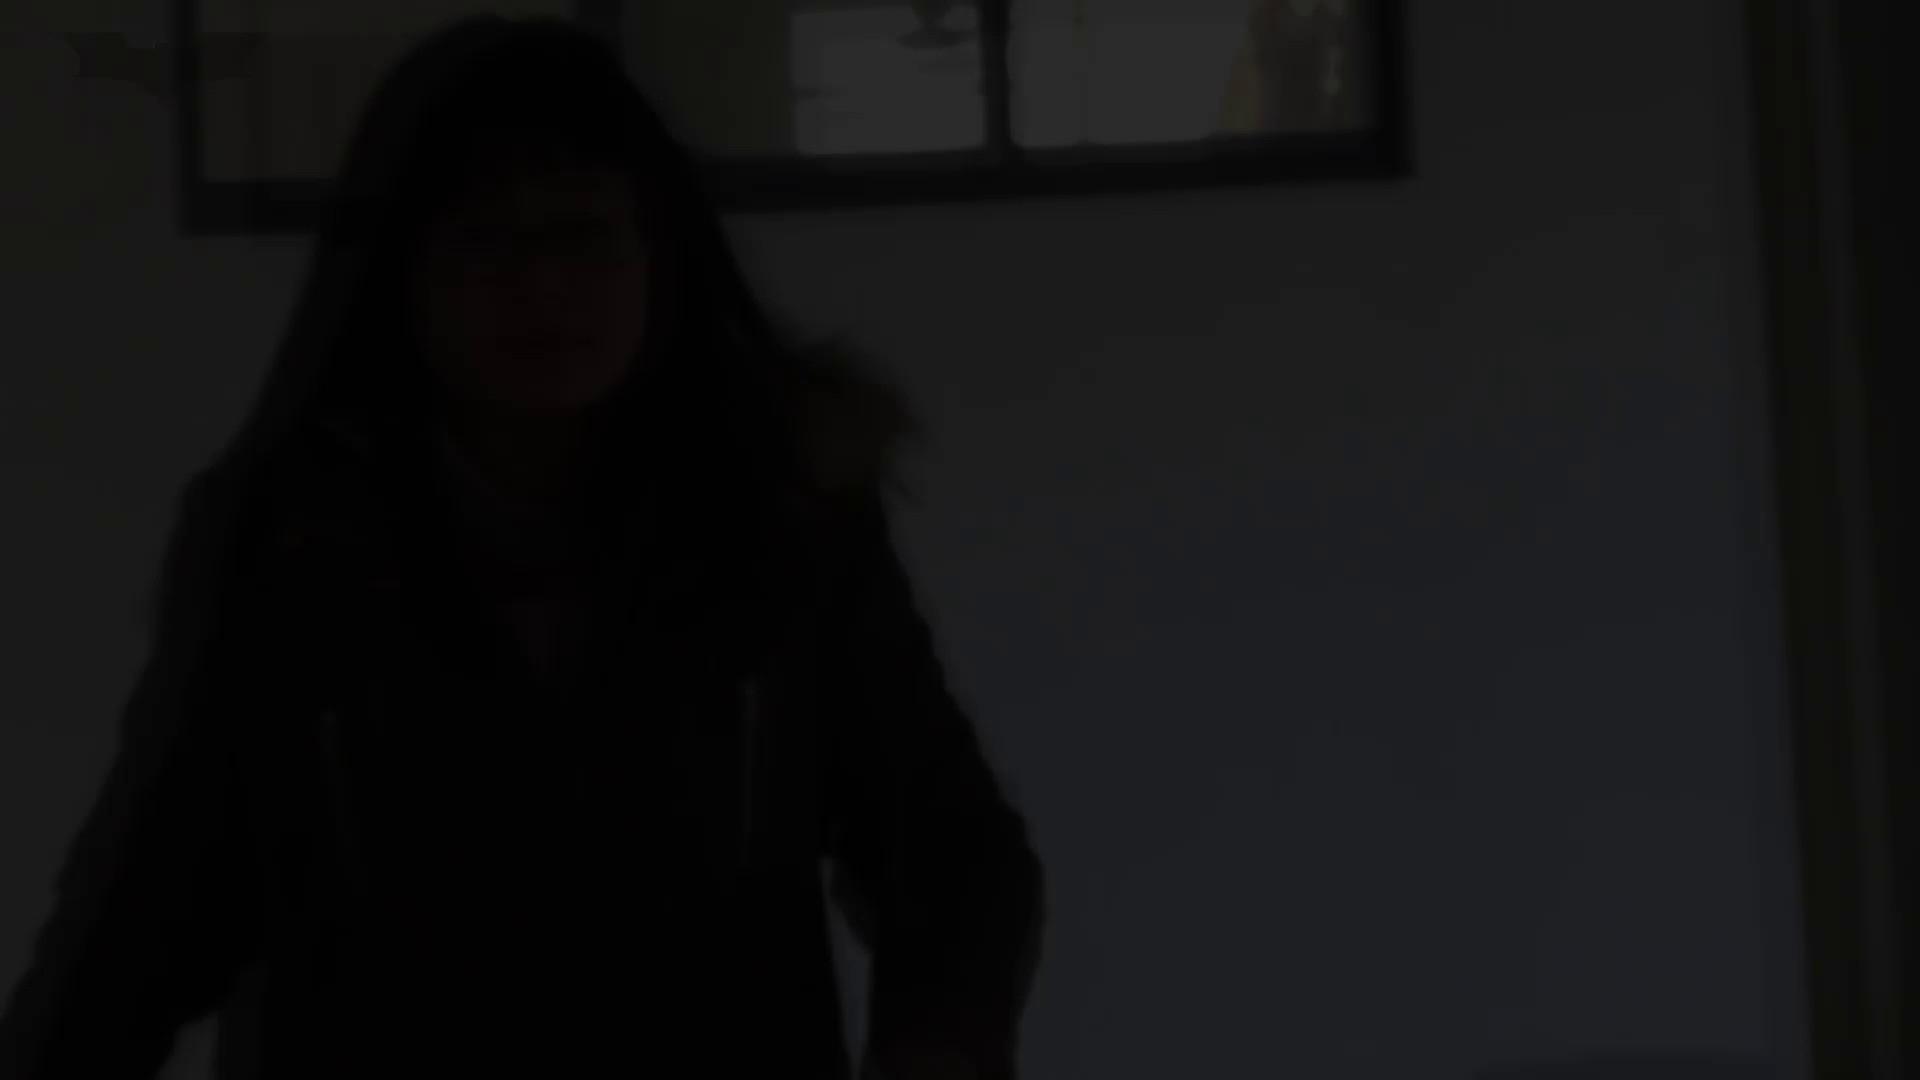 JD盗撮 美女の洗面所の秘密 Vol.26 OLのボディ 盗み撮り動画キャプチャ 73PIX 57